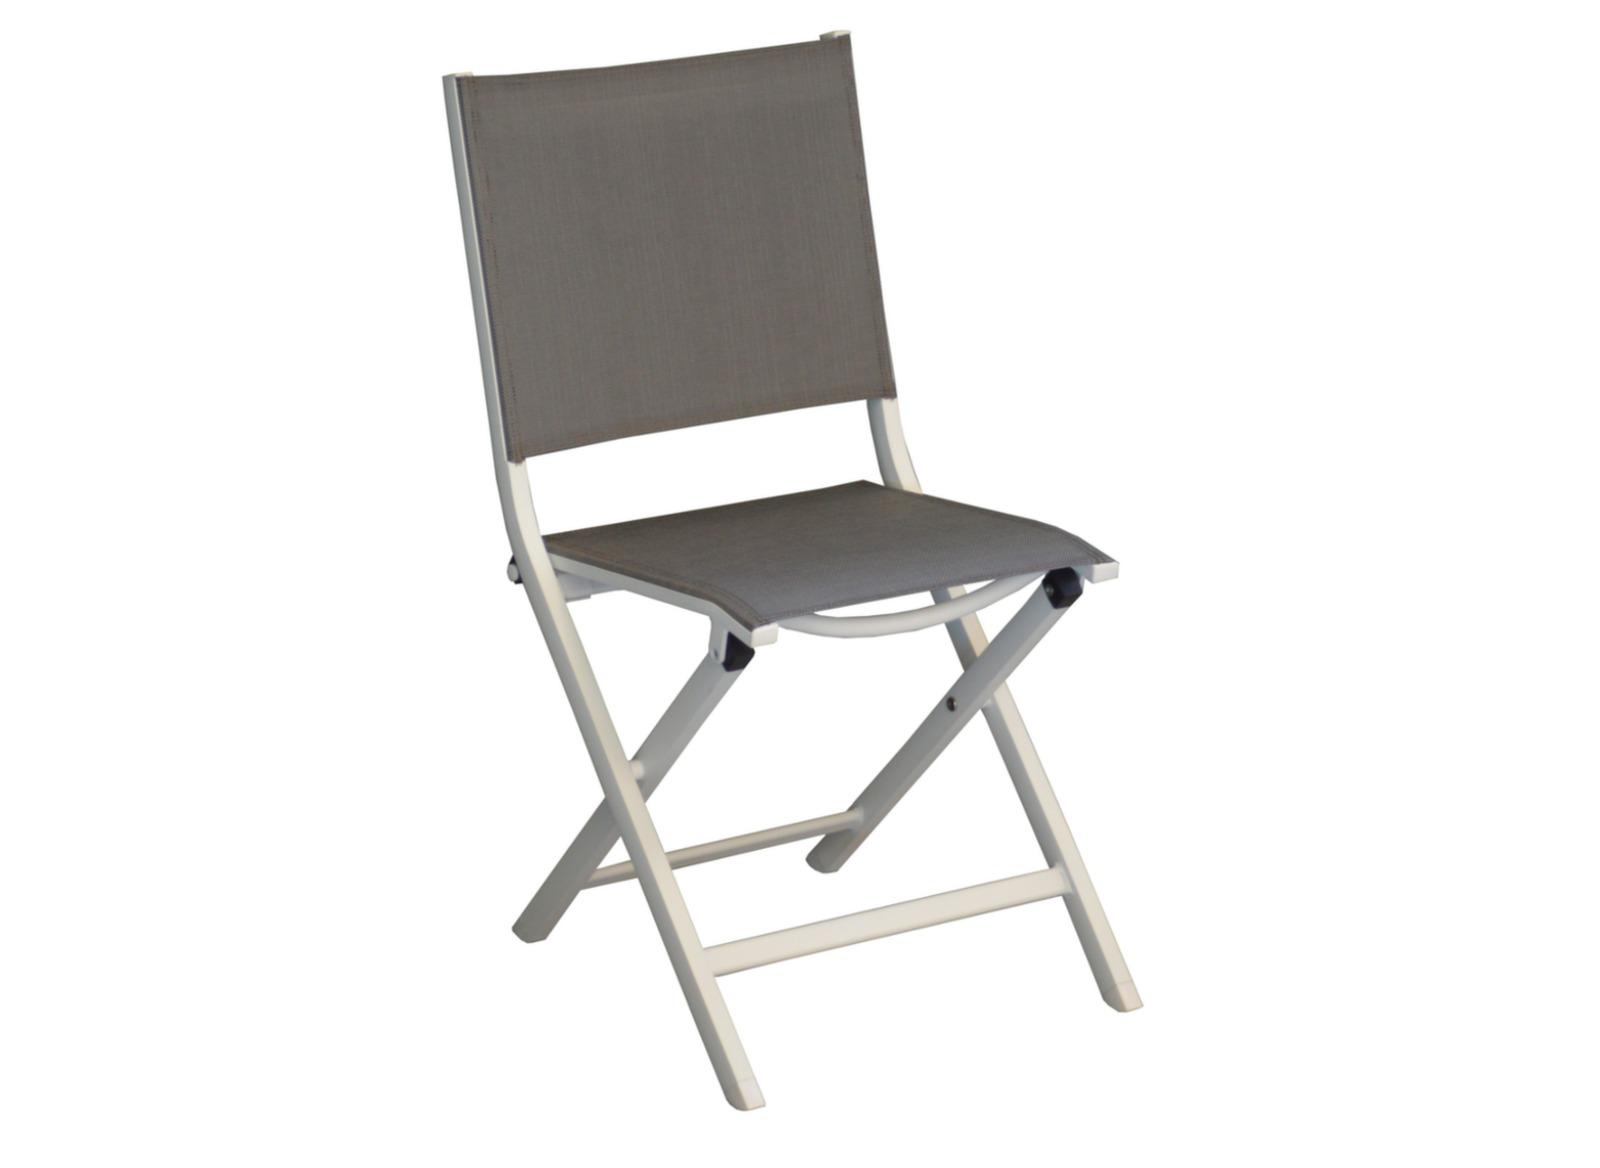 chaises de jardin en aluminium thema - proloisirs - Chaise De Jardin Pliante Aluminium